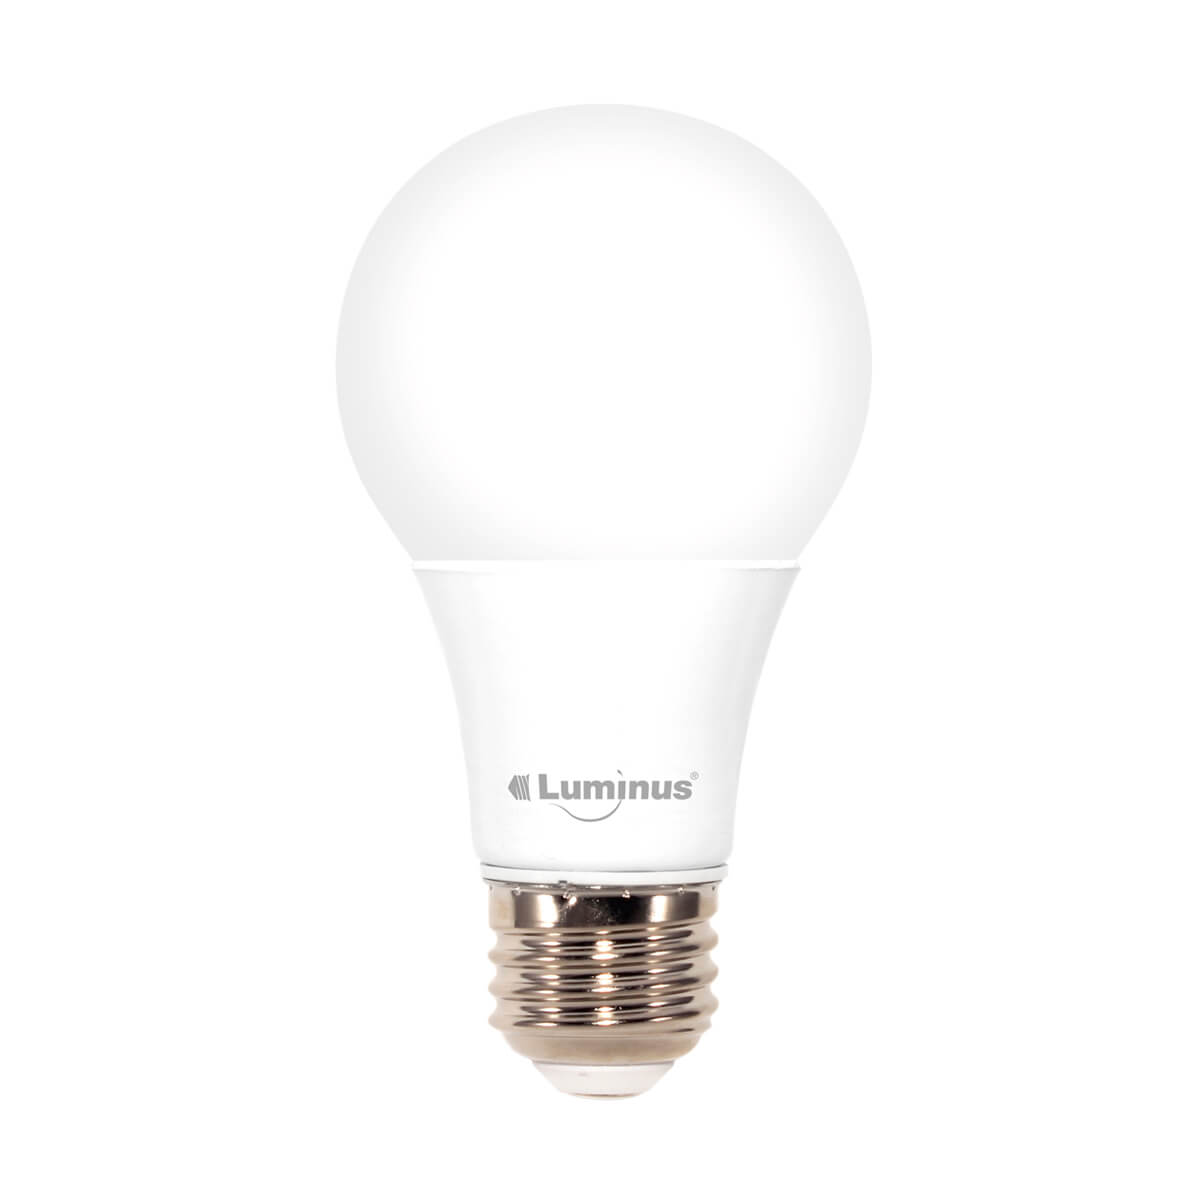 Luminus LED 9W 5000K A19 ND - 2 Pack